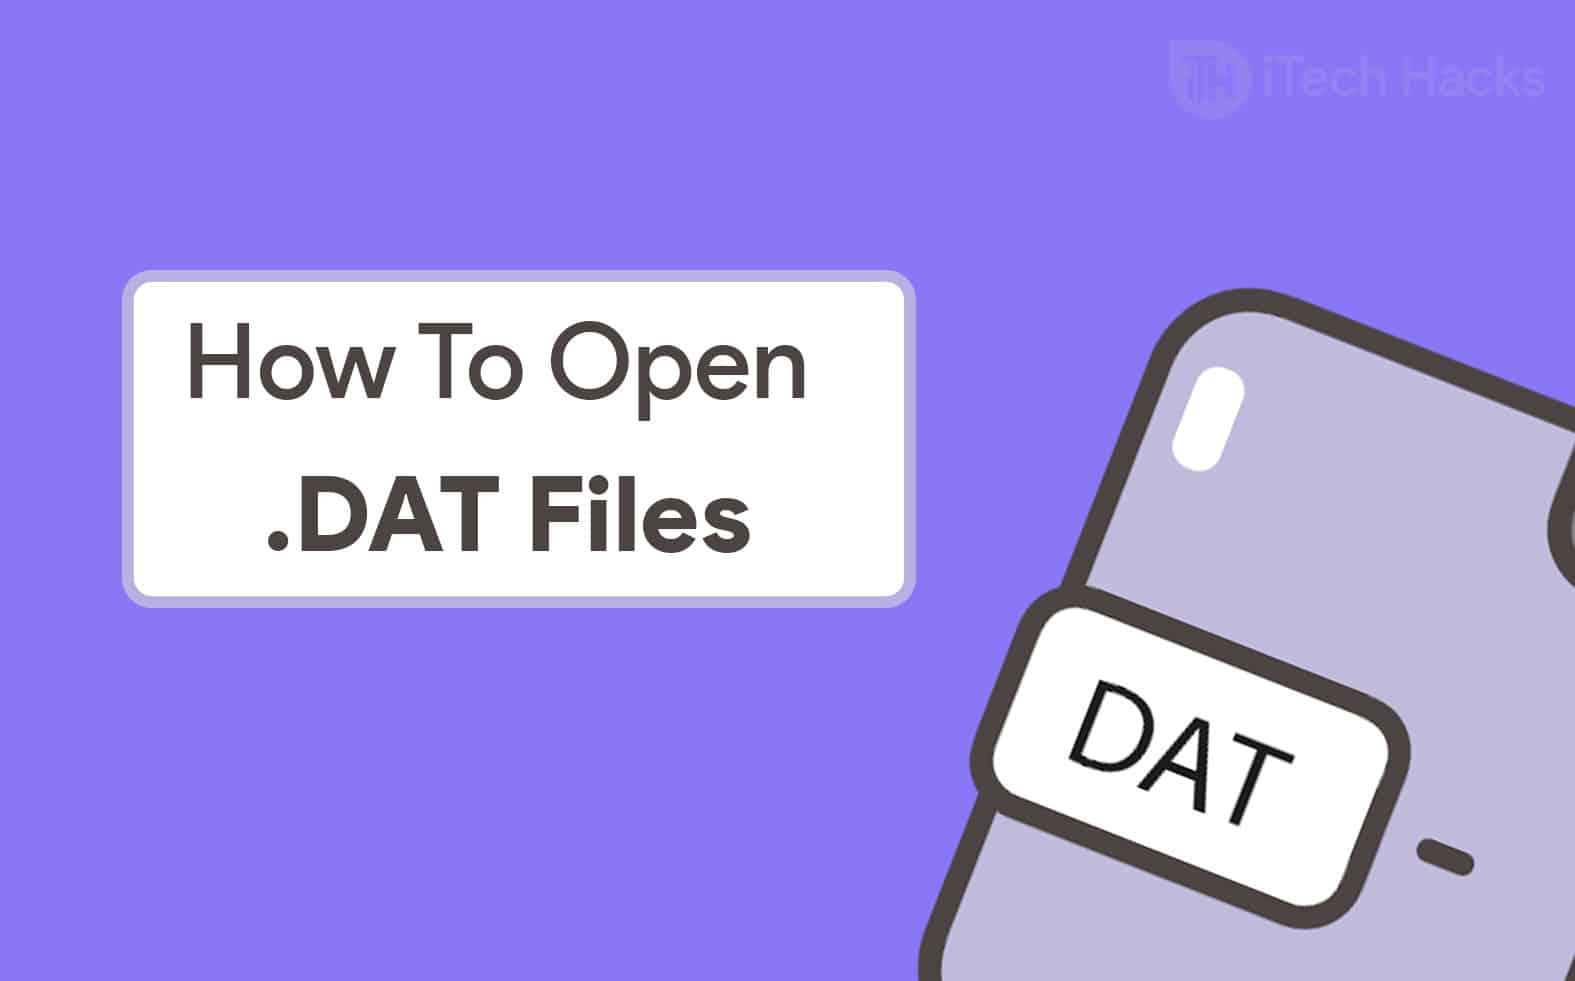 How To Open DAT Files in Windows 10 & Mac